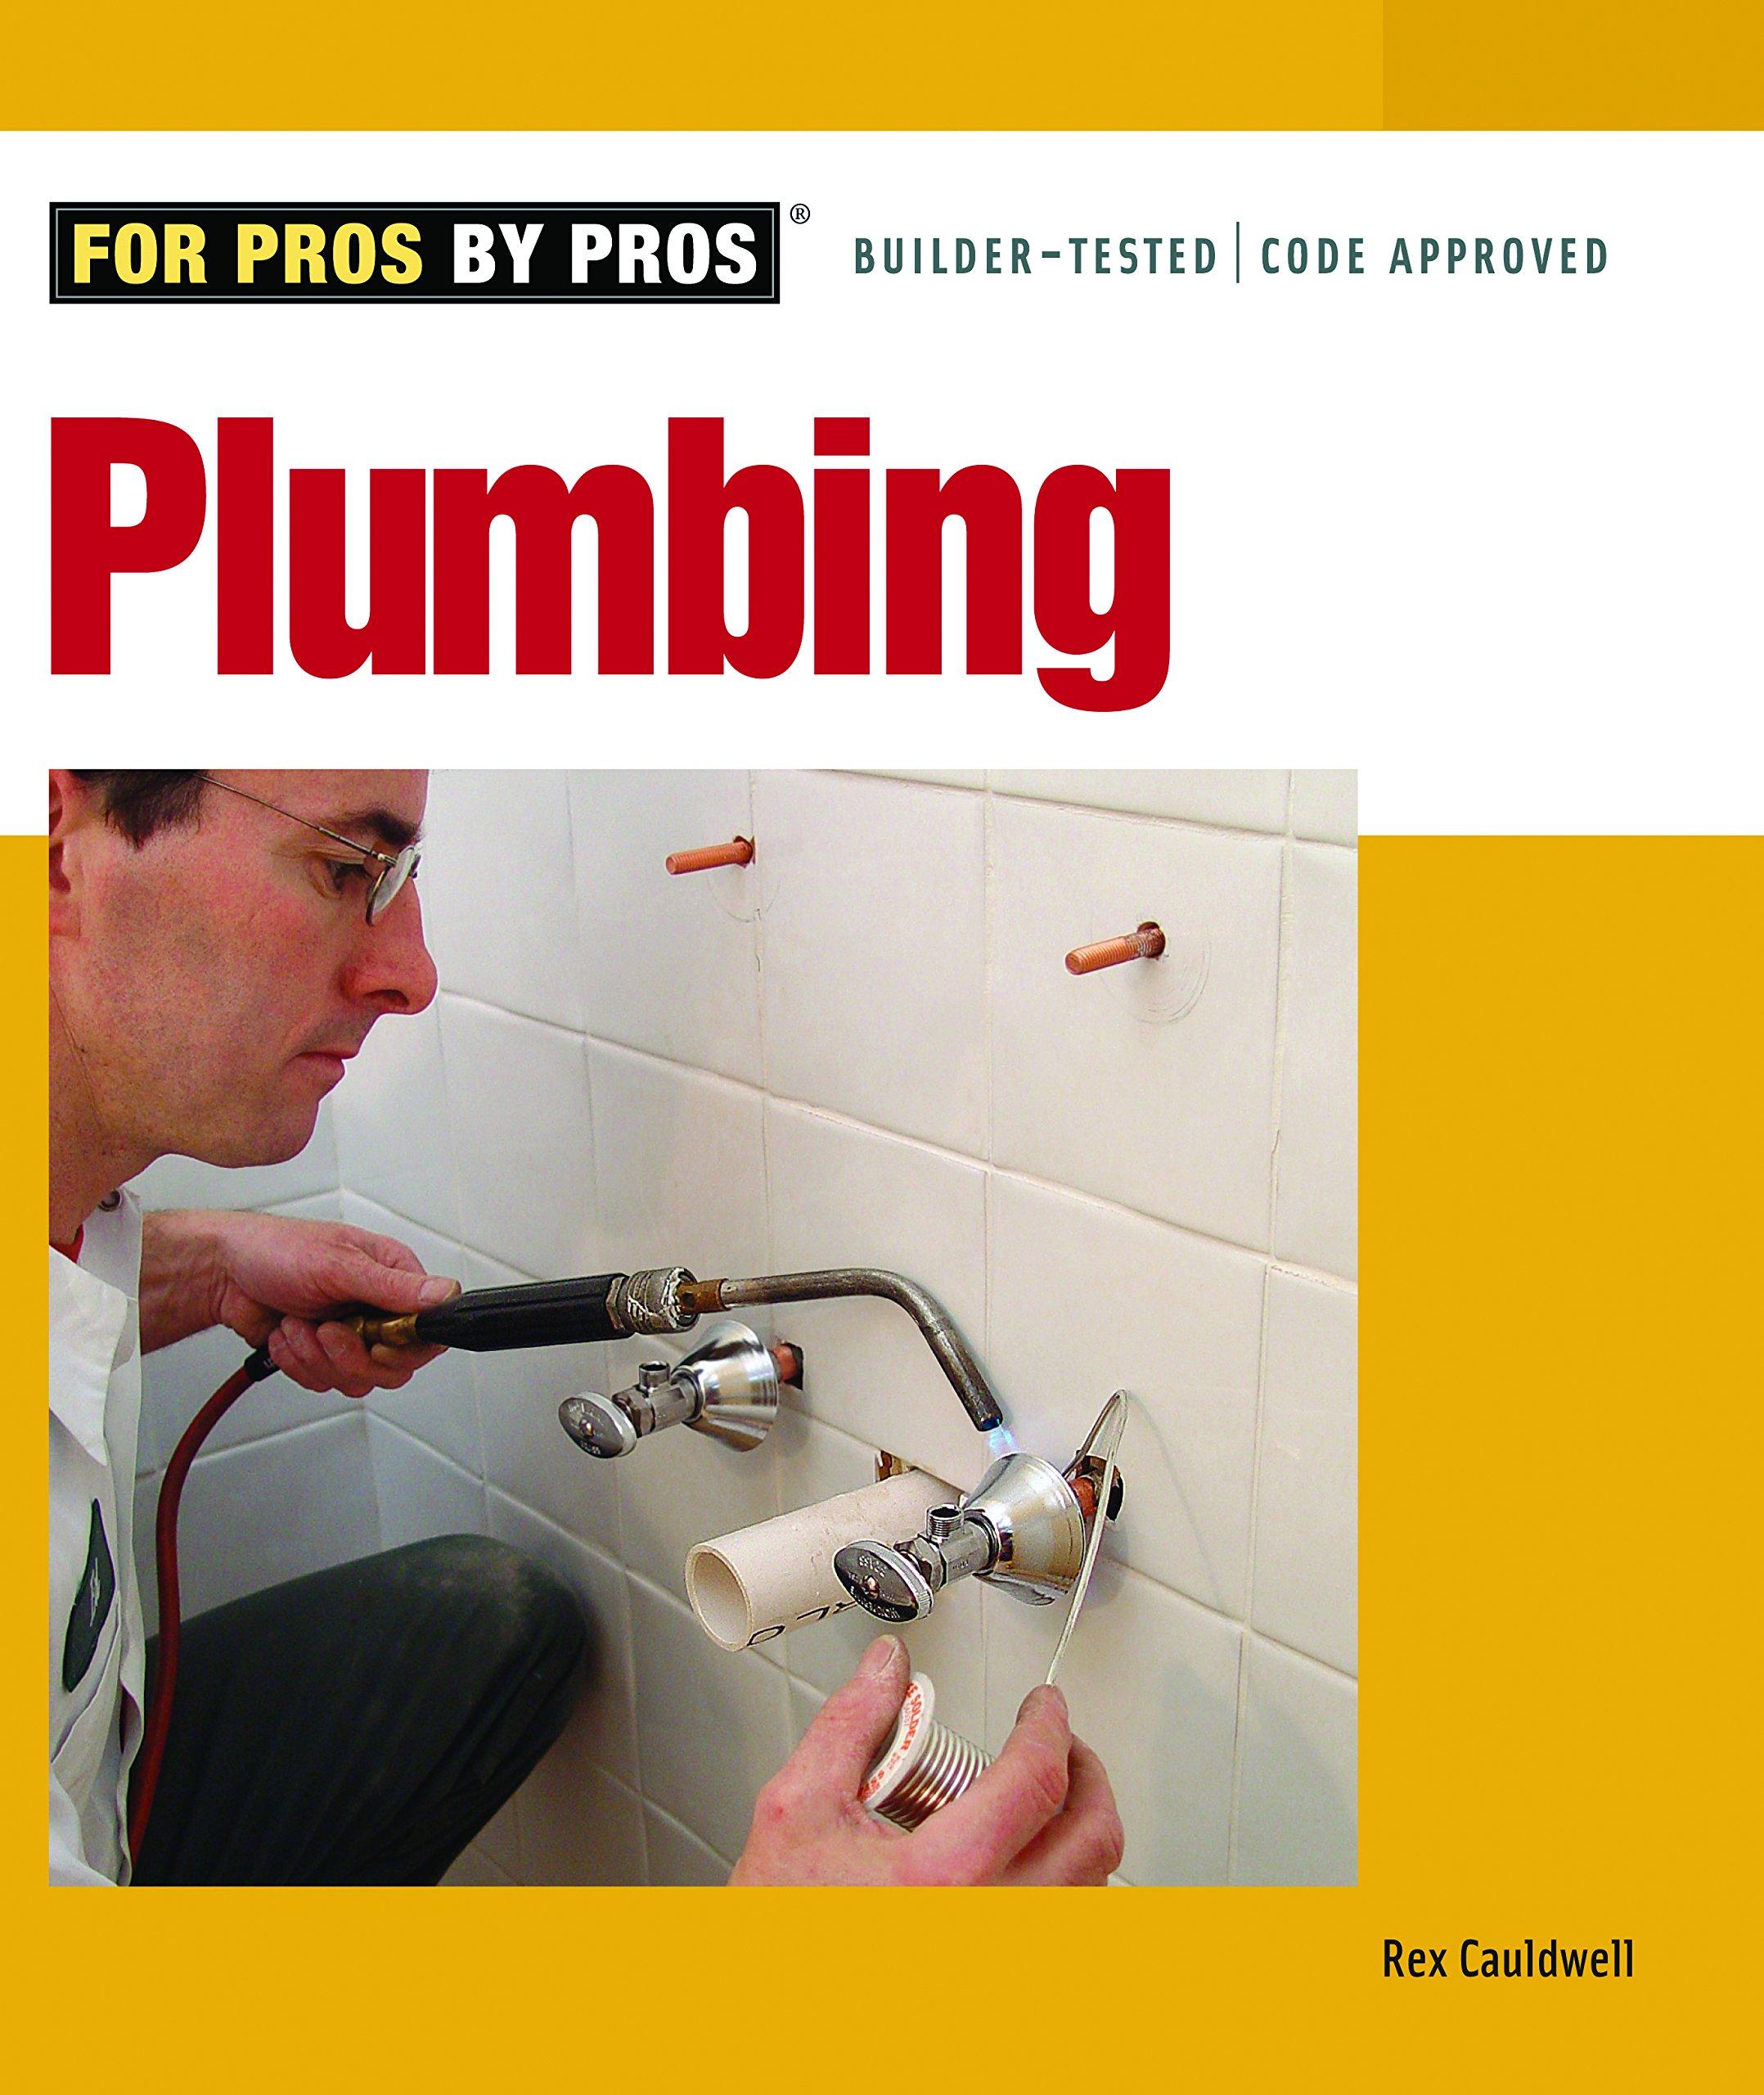 Plumbing Pros Rex Cauldwell